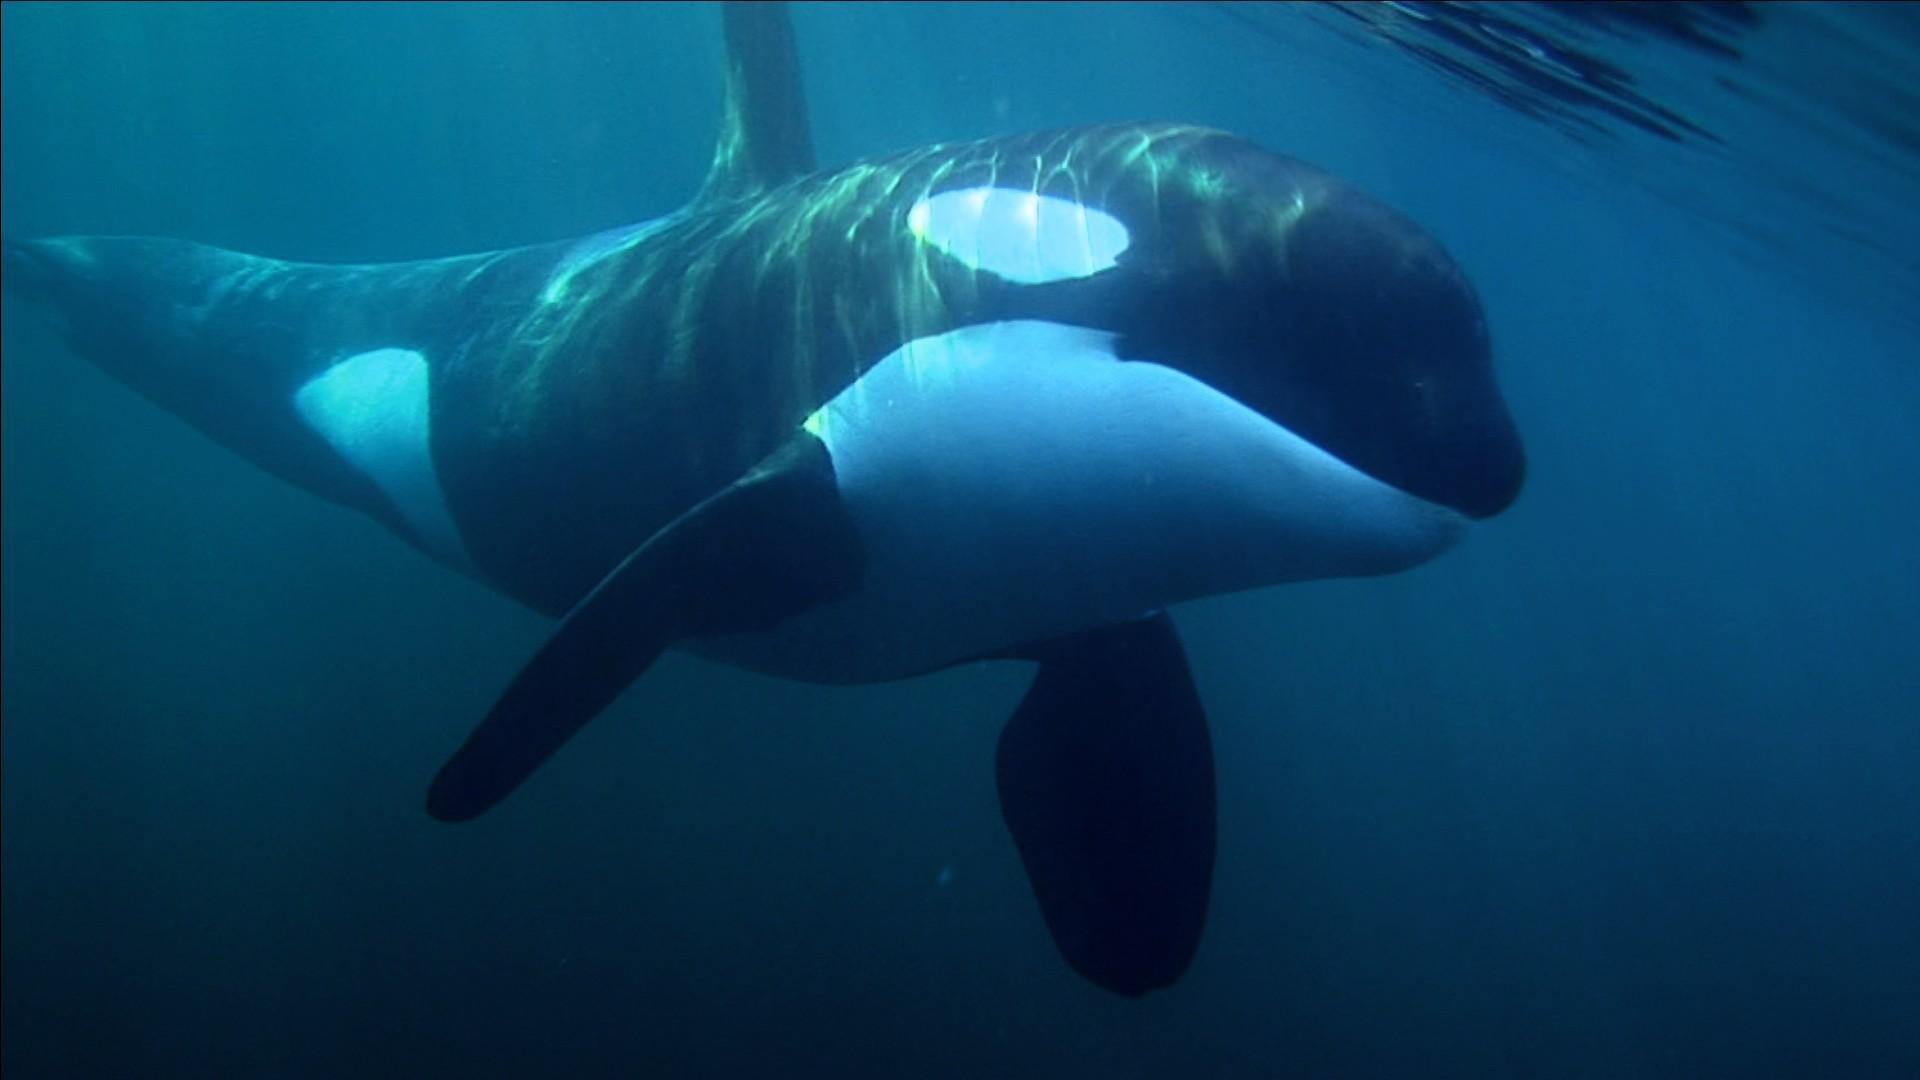 Orca wallpaper download altavistaventures Images